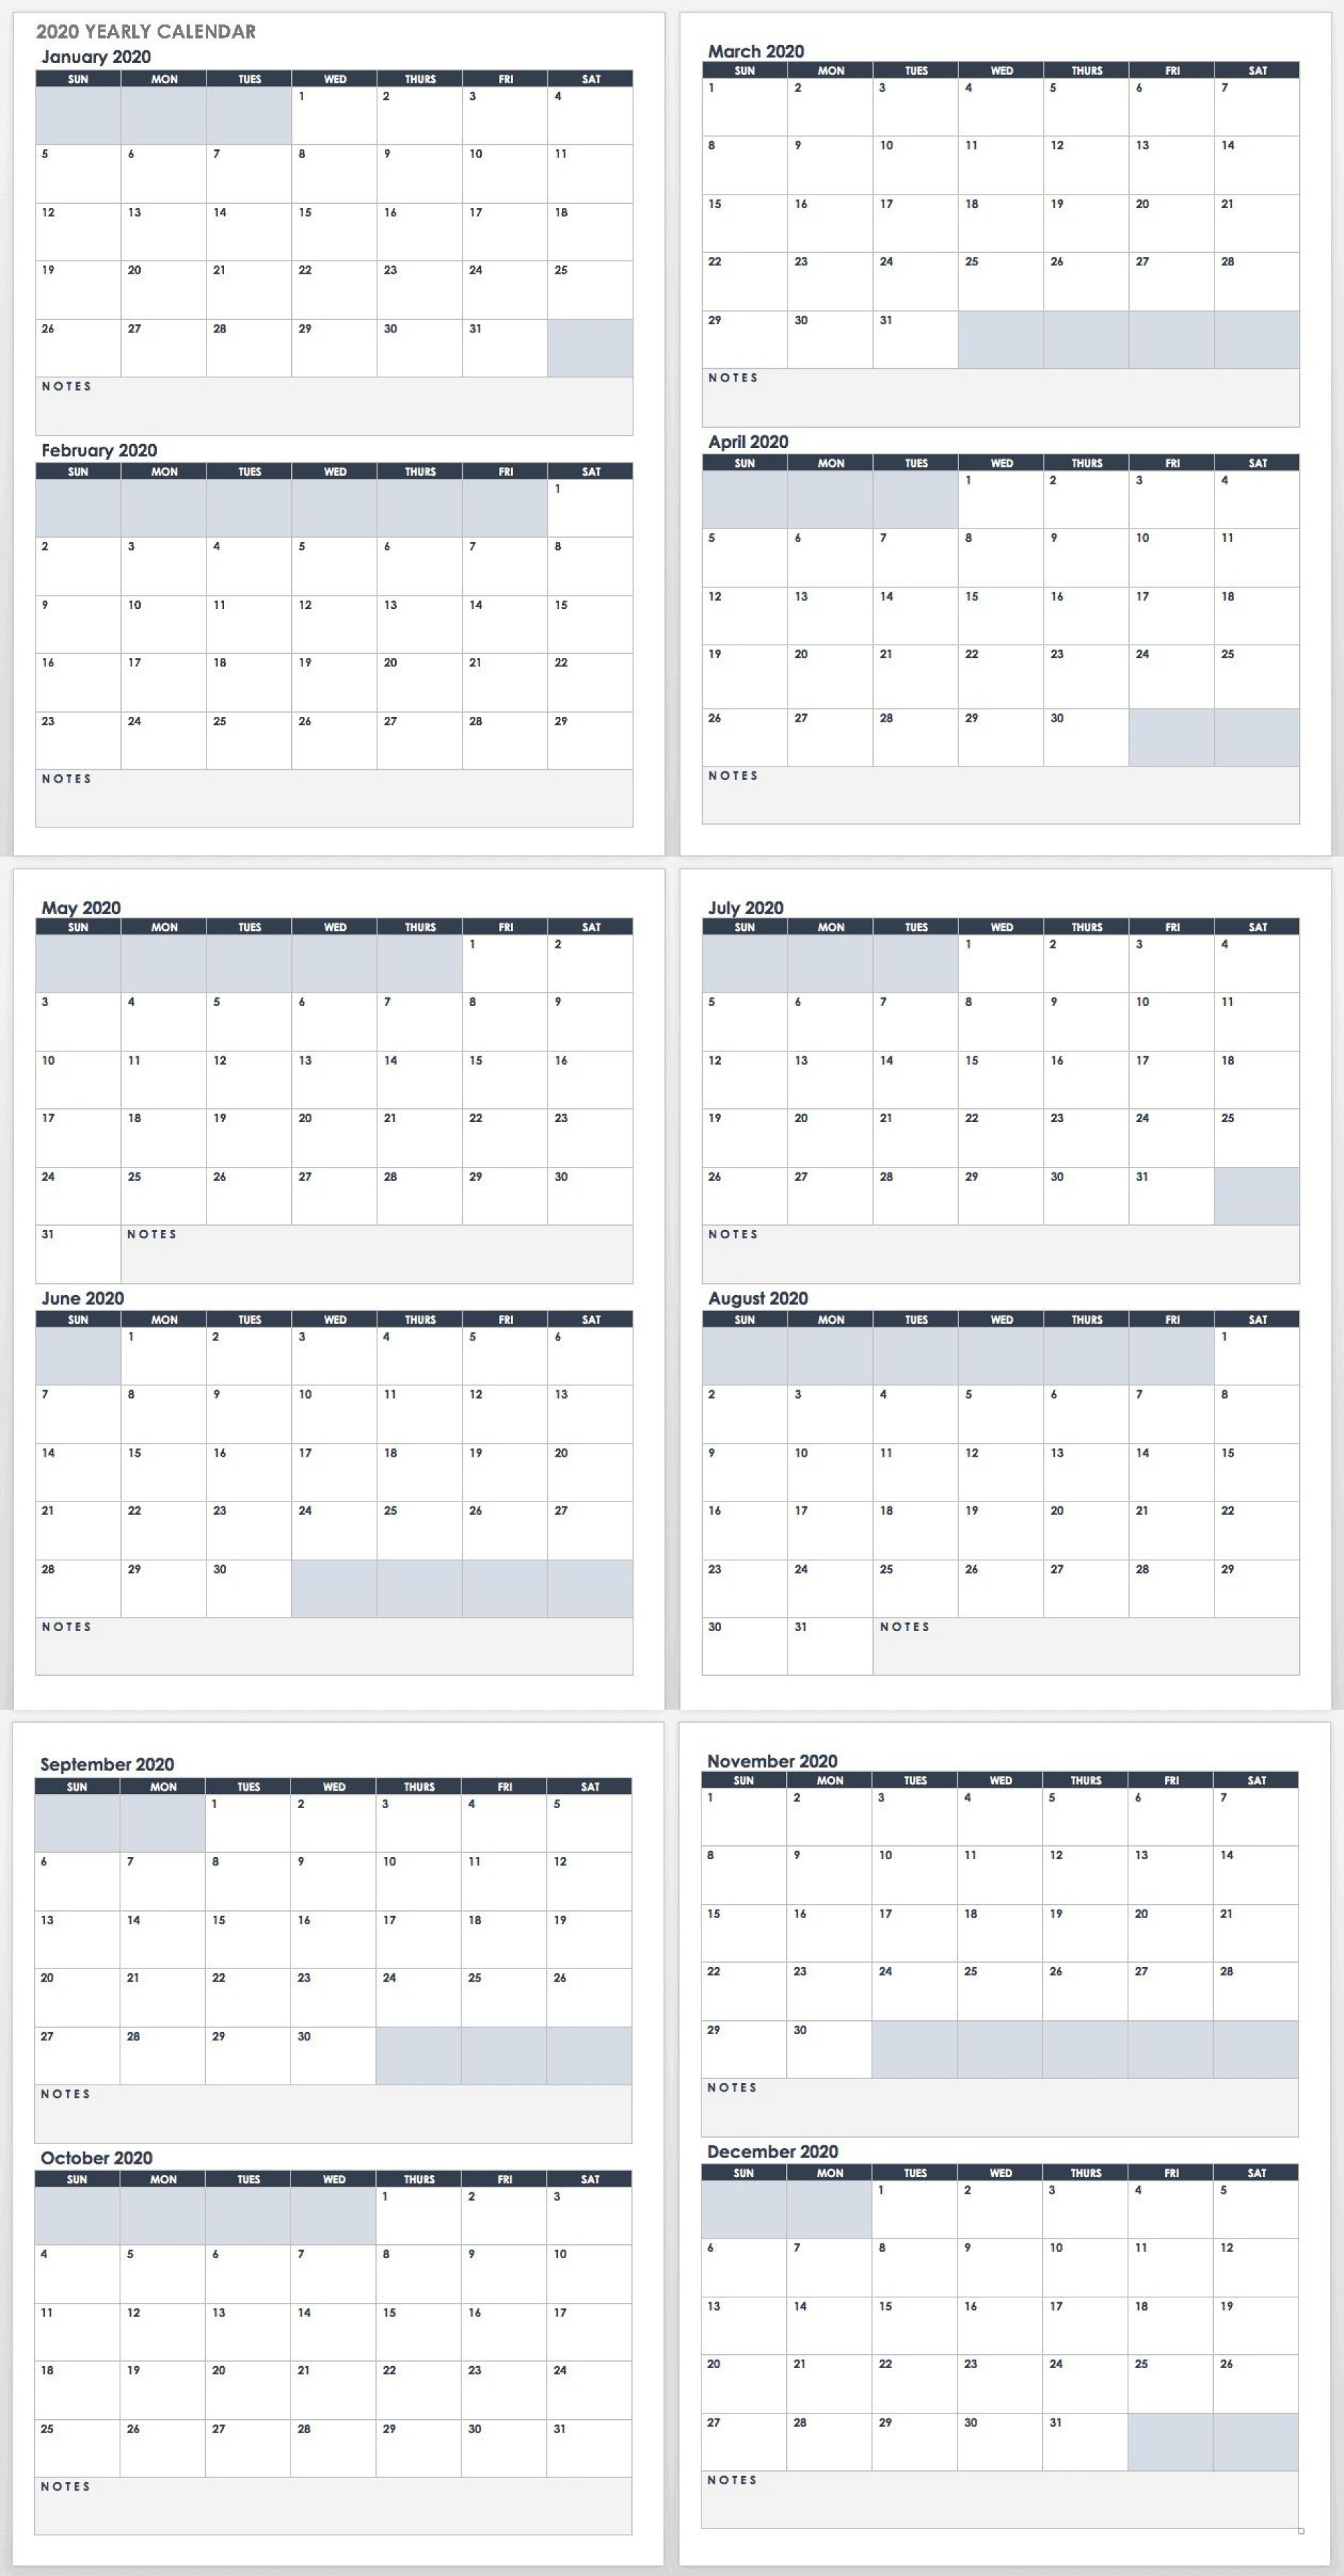 007 Unusual Calendar Template Google Doc High Resolution  Docs Editable Two Week 2019-201920